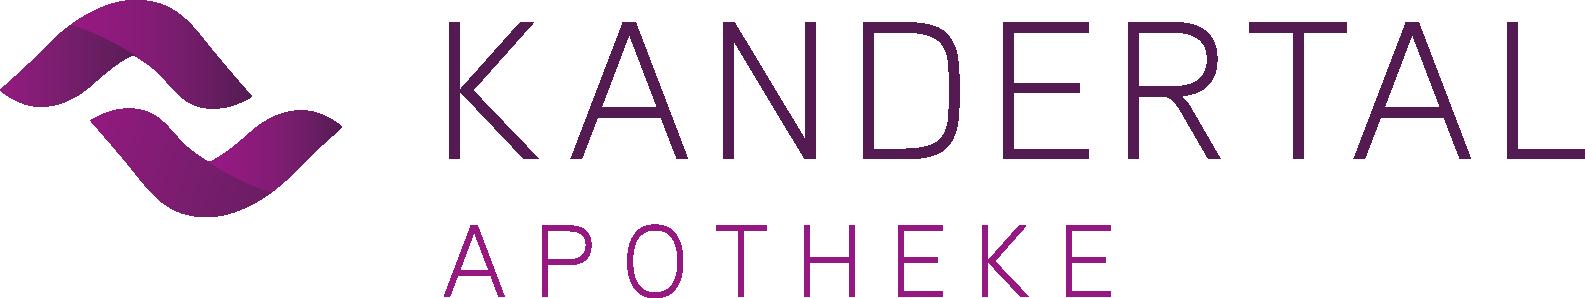 logo-kandertal-apotheke